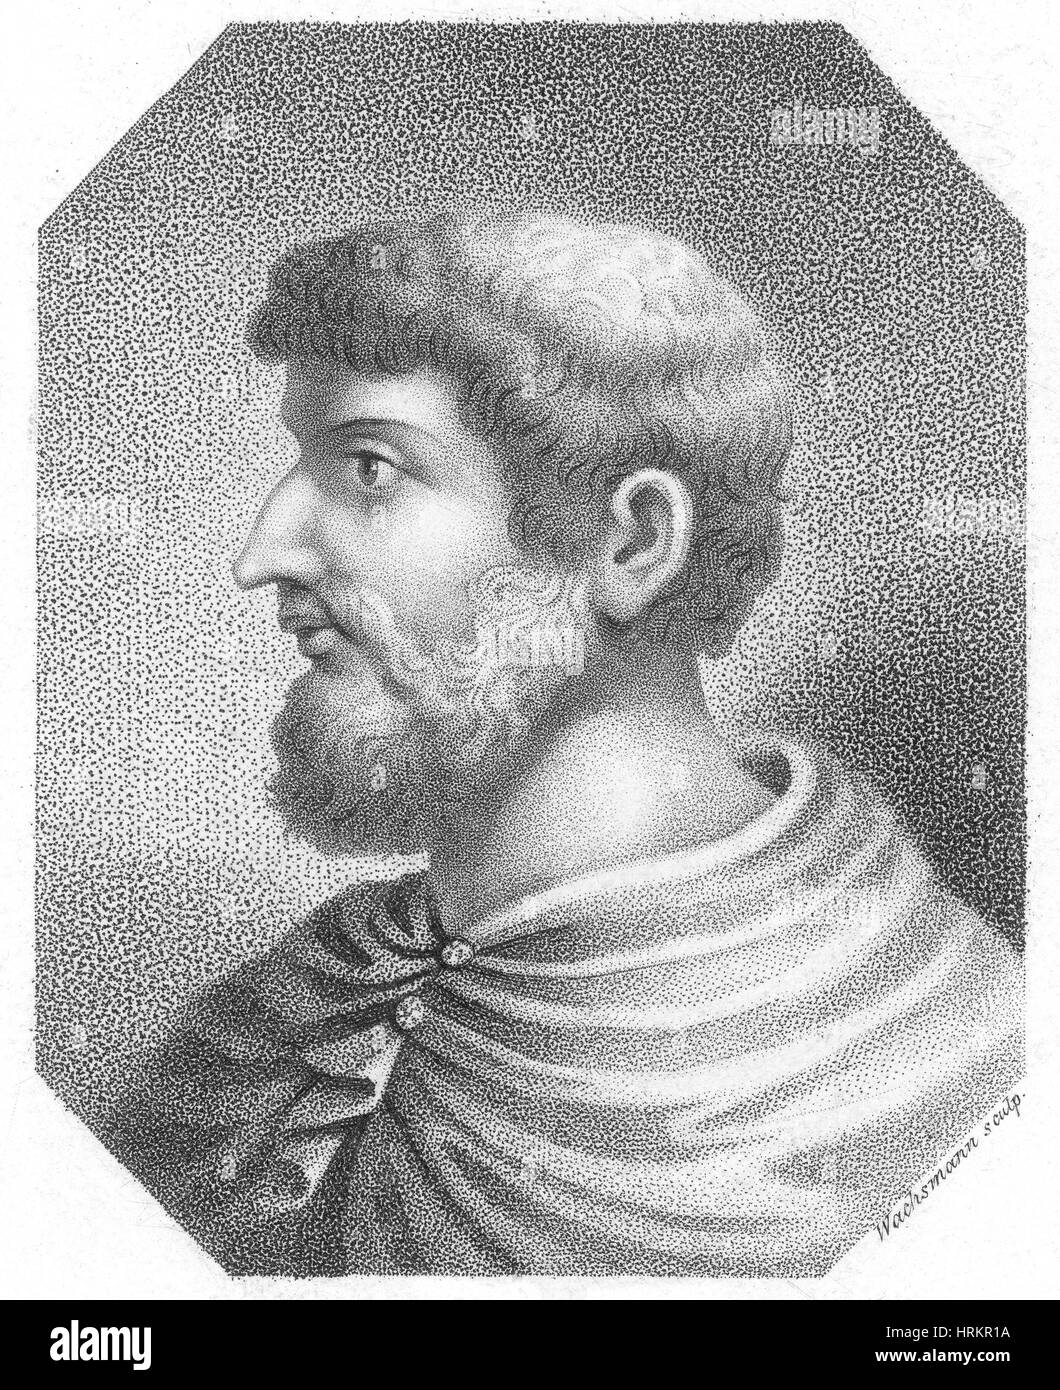 Callimachus, Greek-Libyan Poet and Scholar - Stock Image